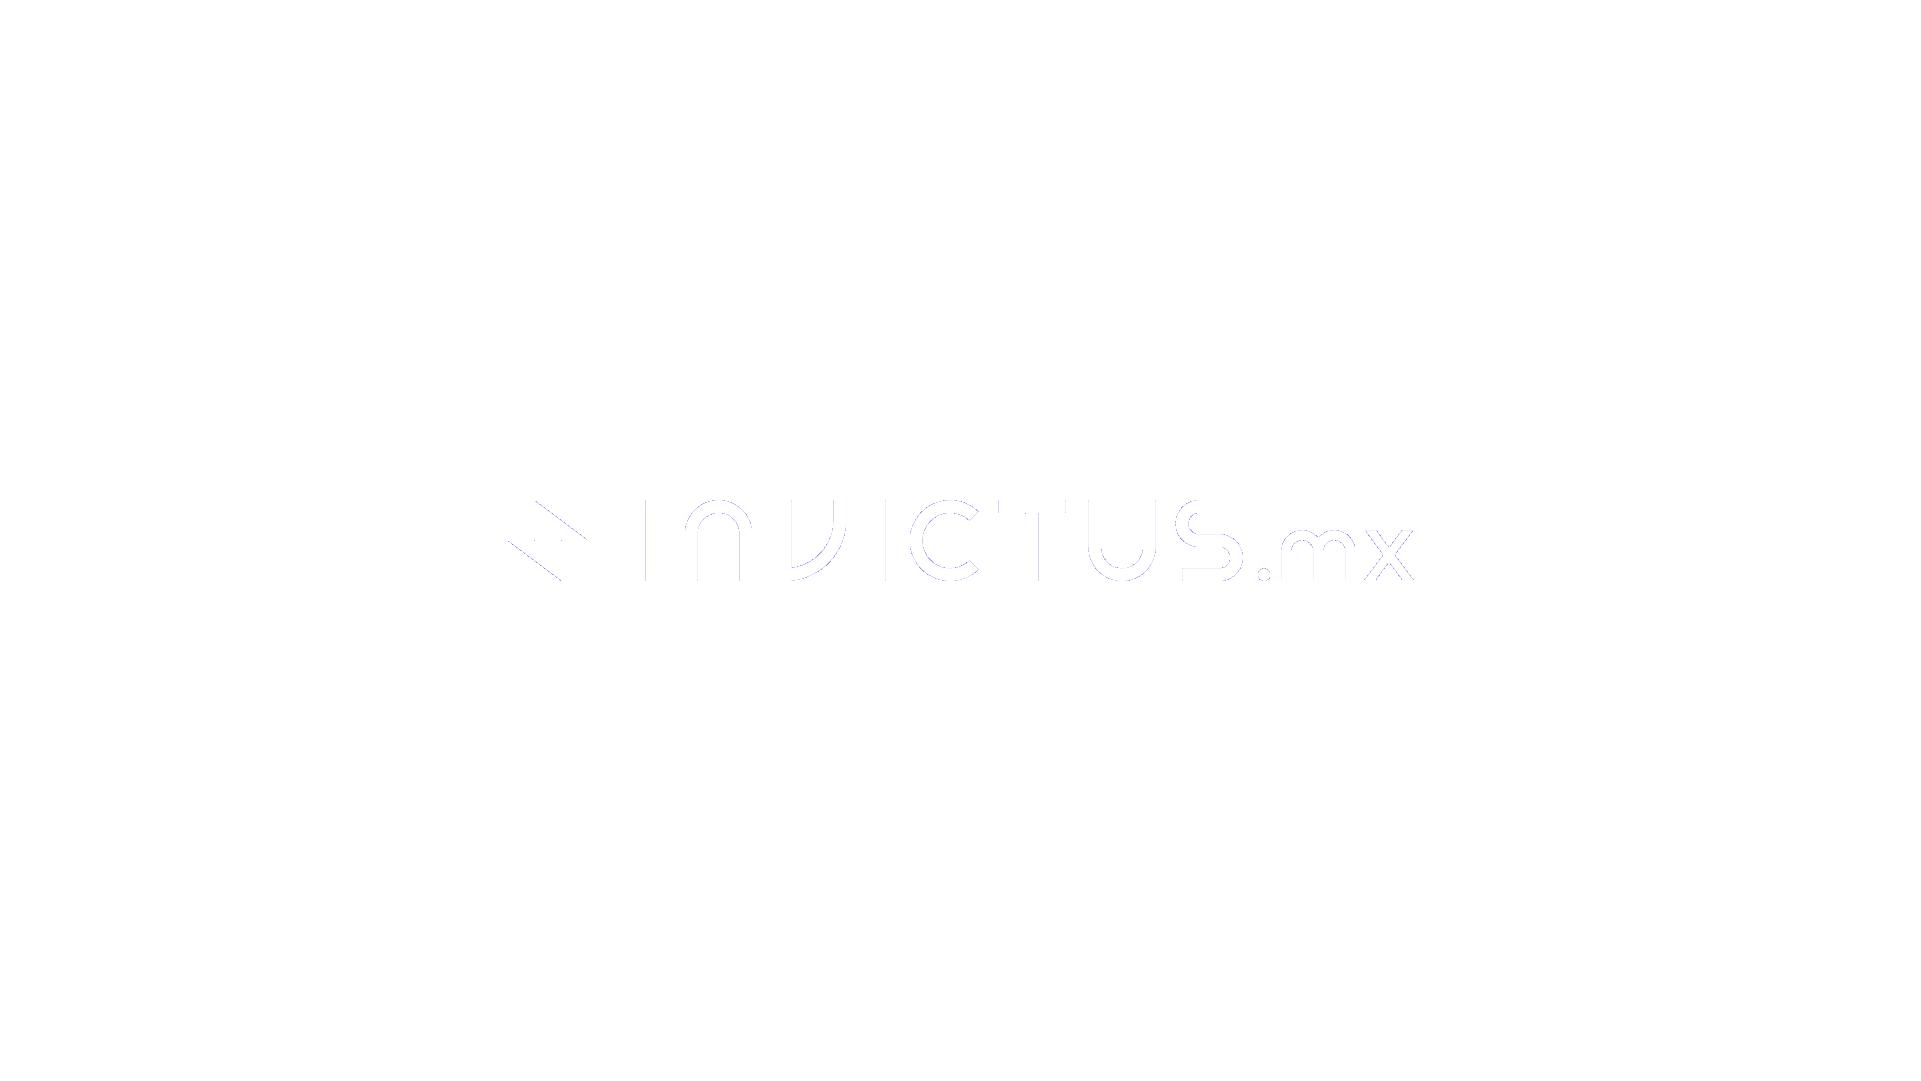 logo blanco invictus.png